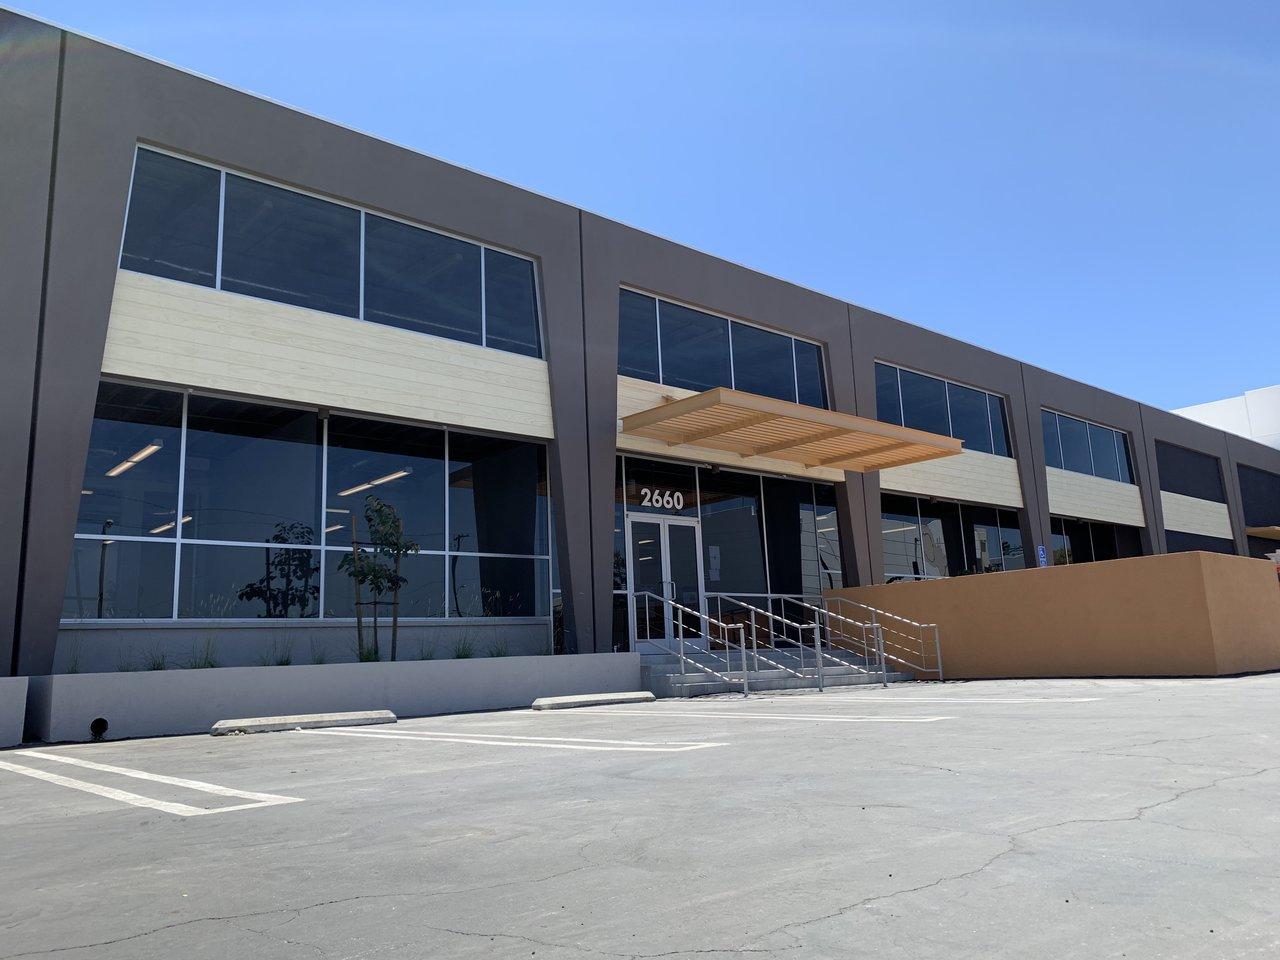 2610-2660 Columbia St, Torrance, CA, 90503